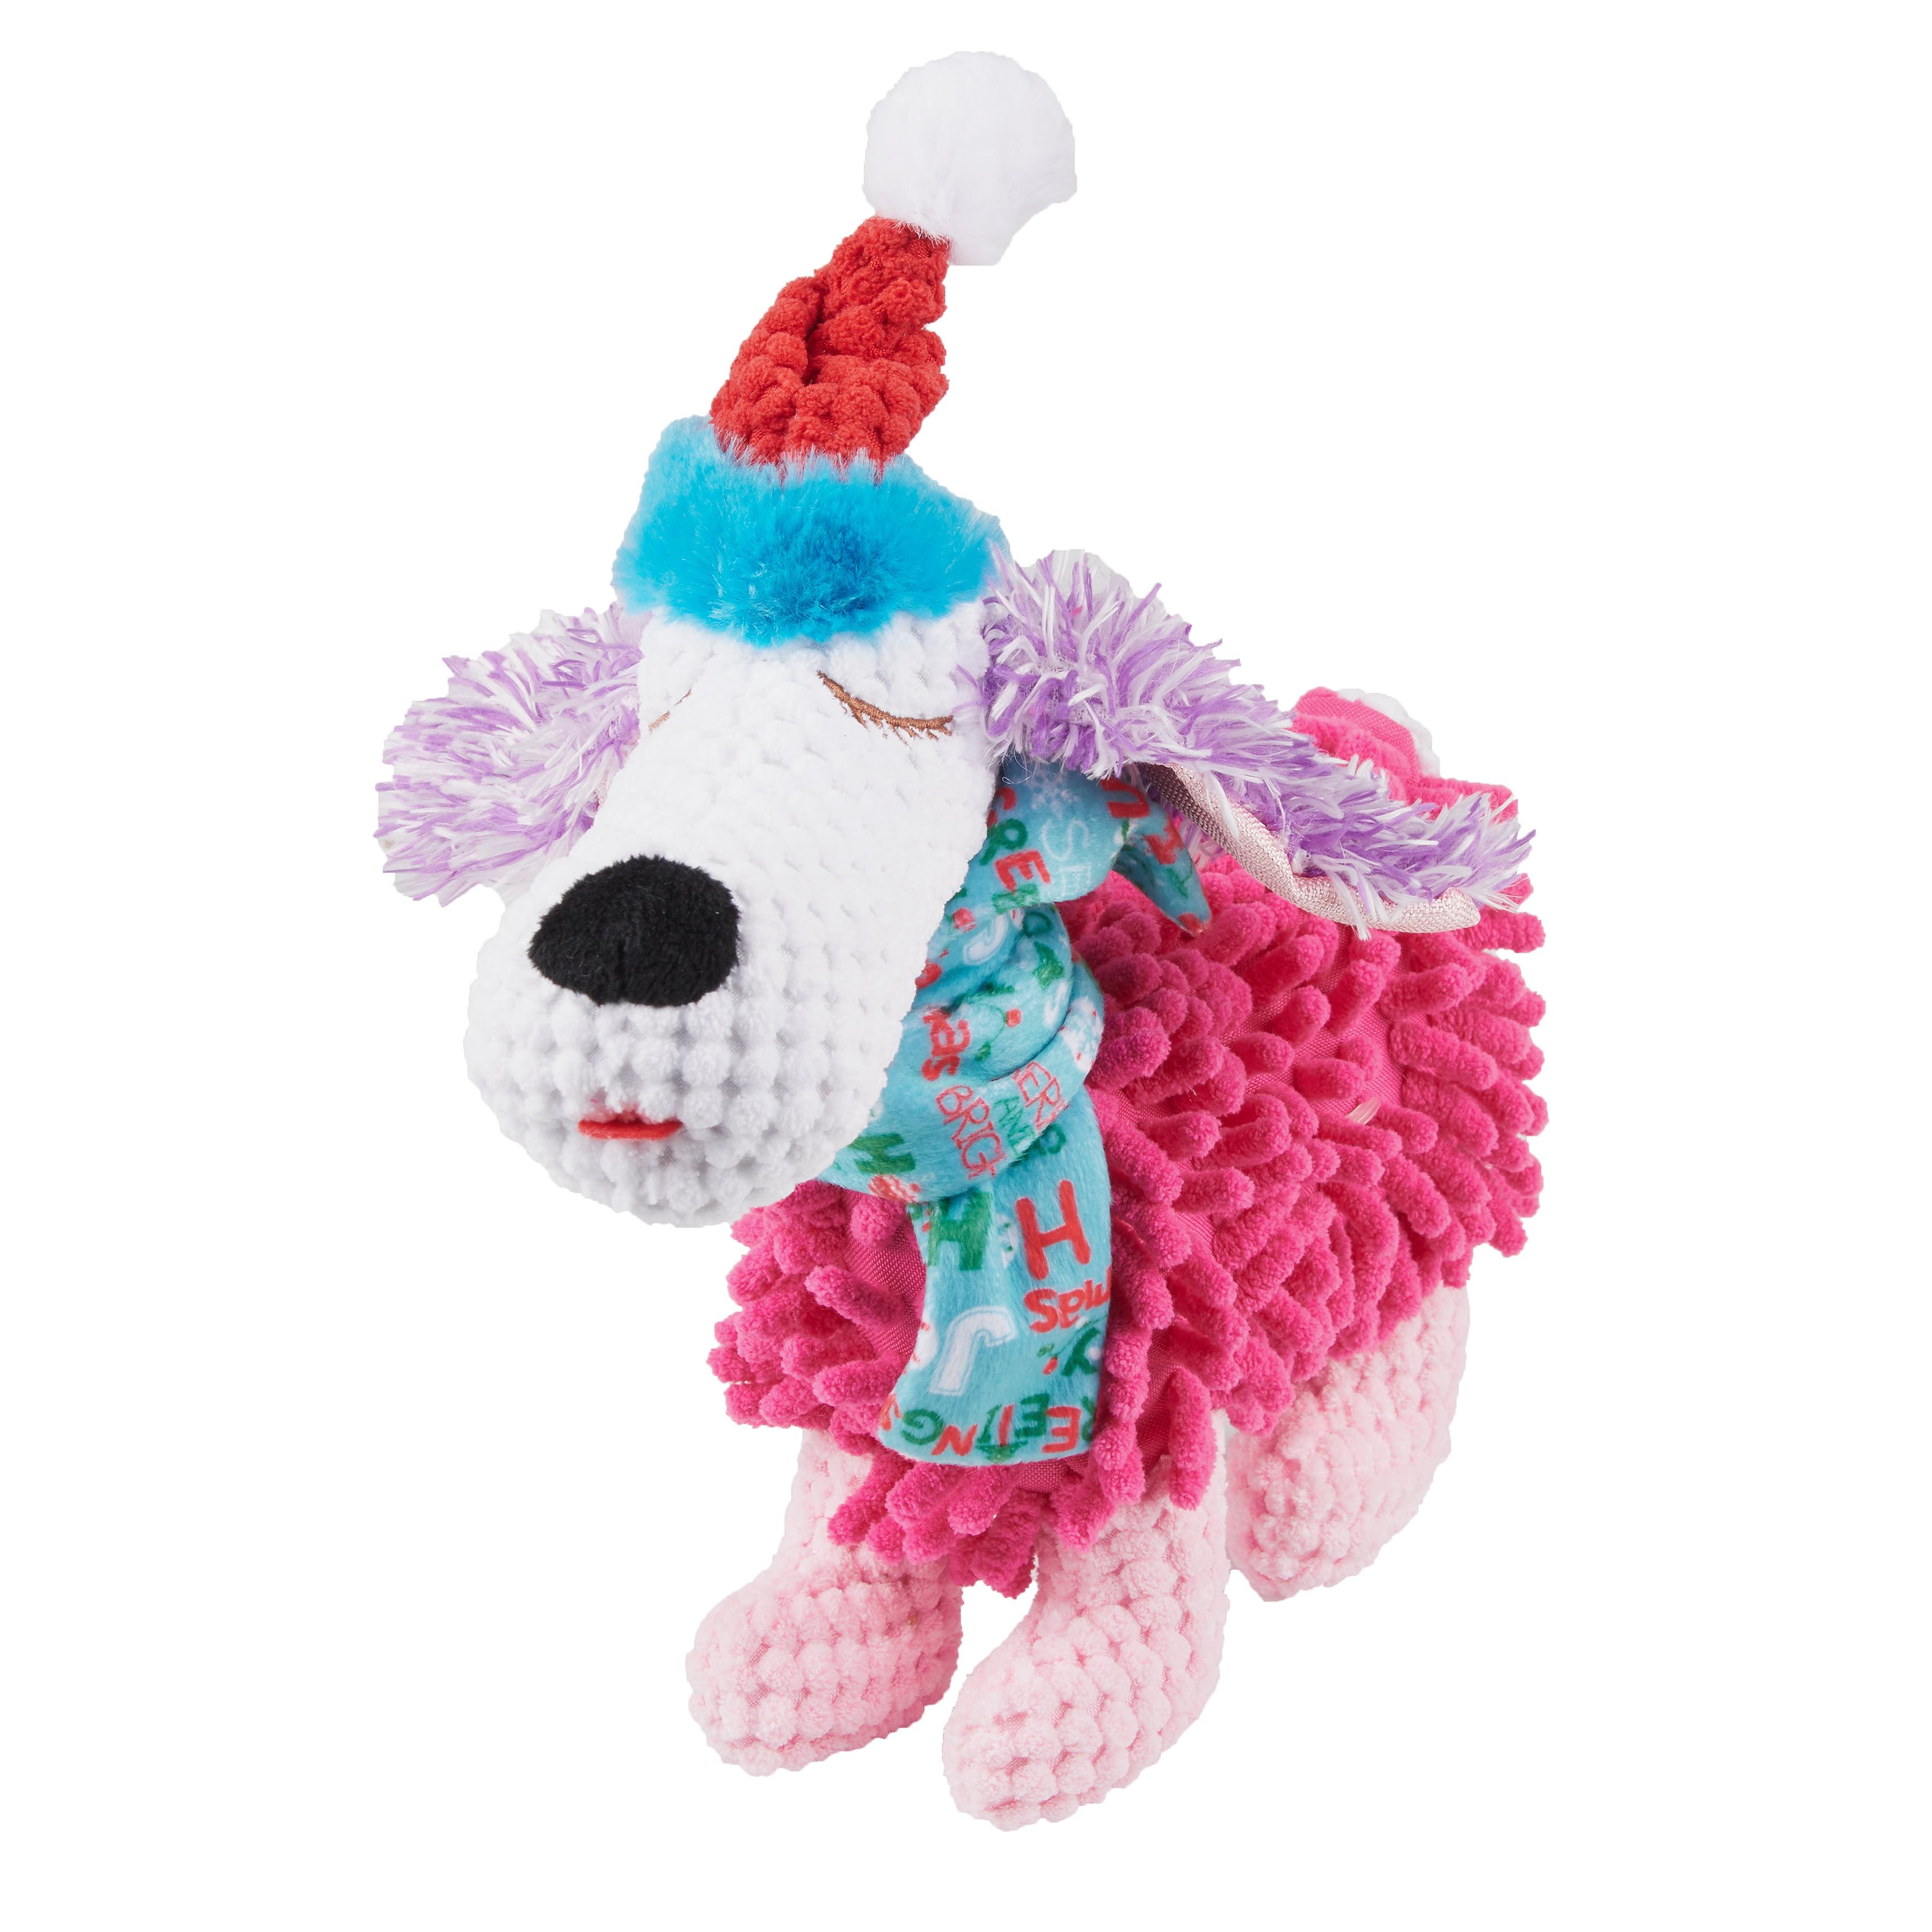 Holiday Time Squeaky Plush Dog Toy, Dog